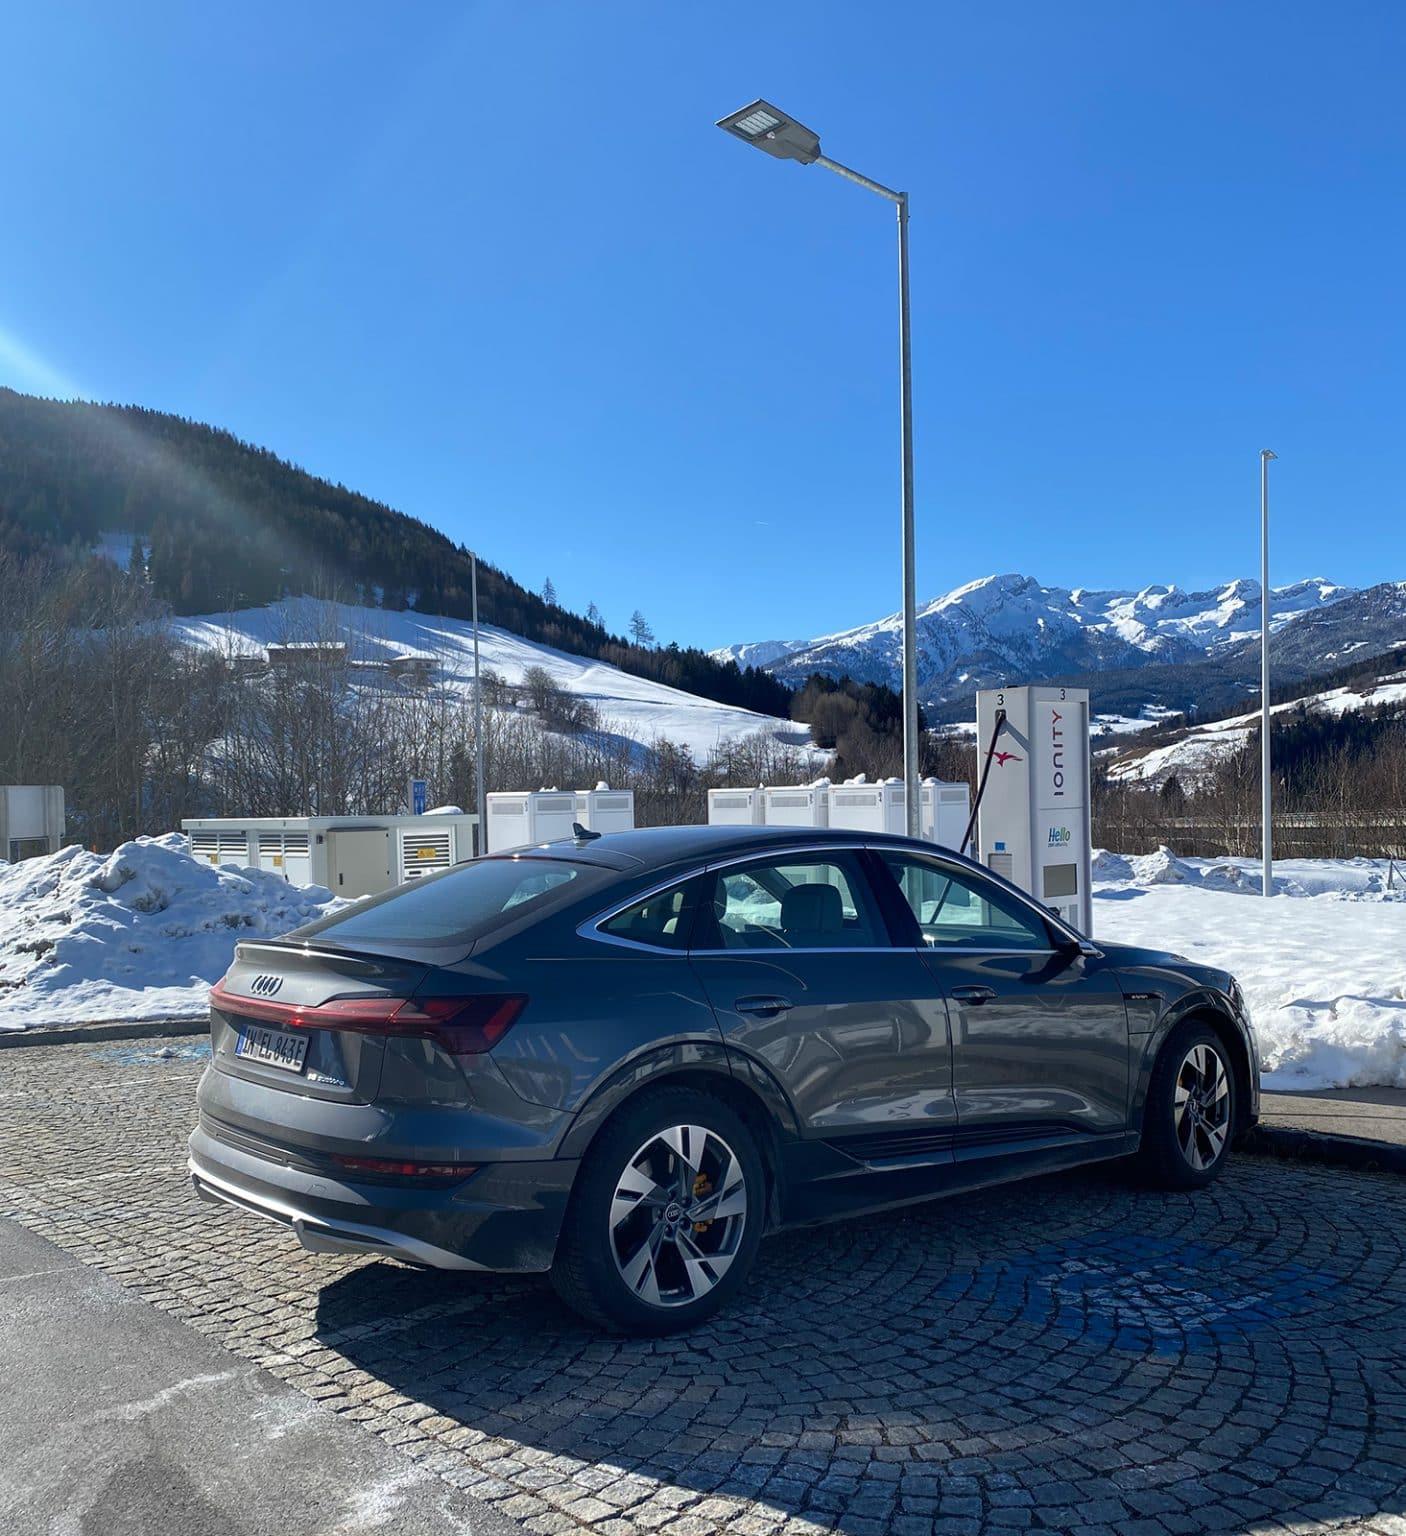 Audi-etron experience report